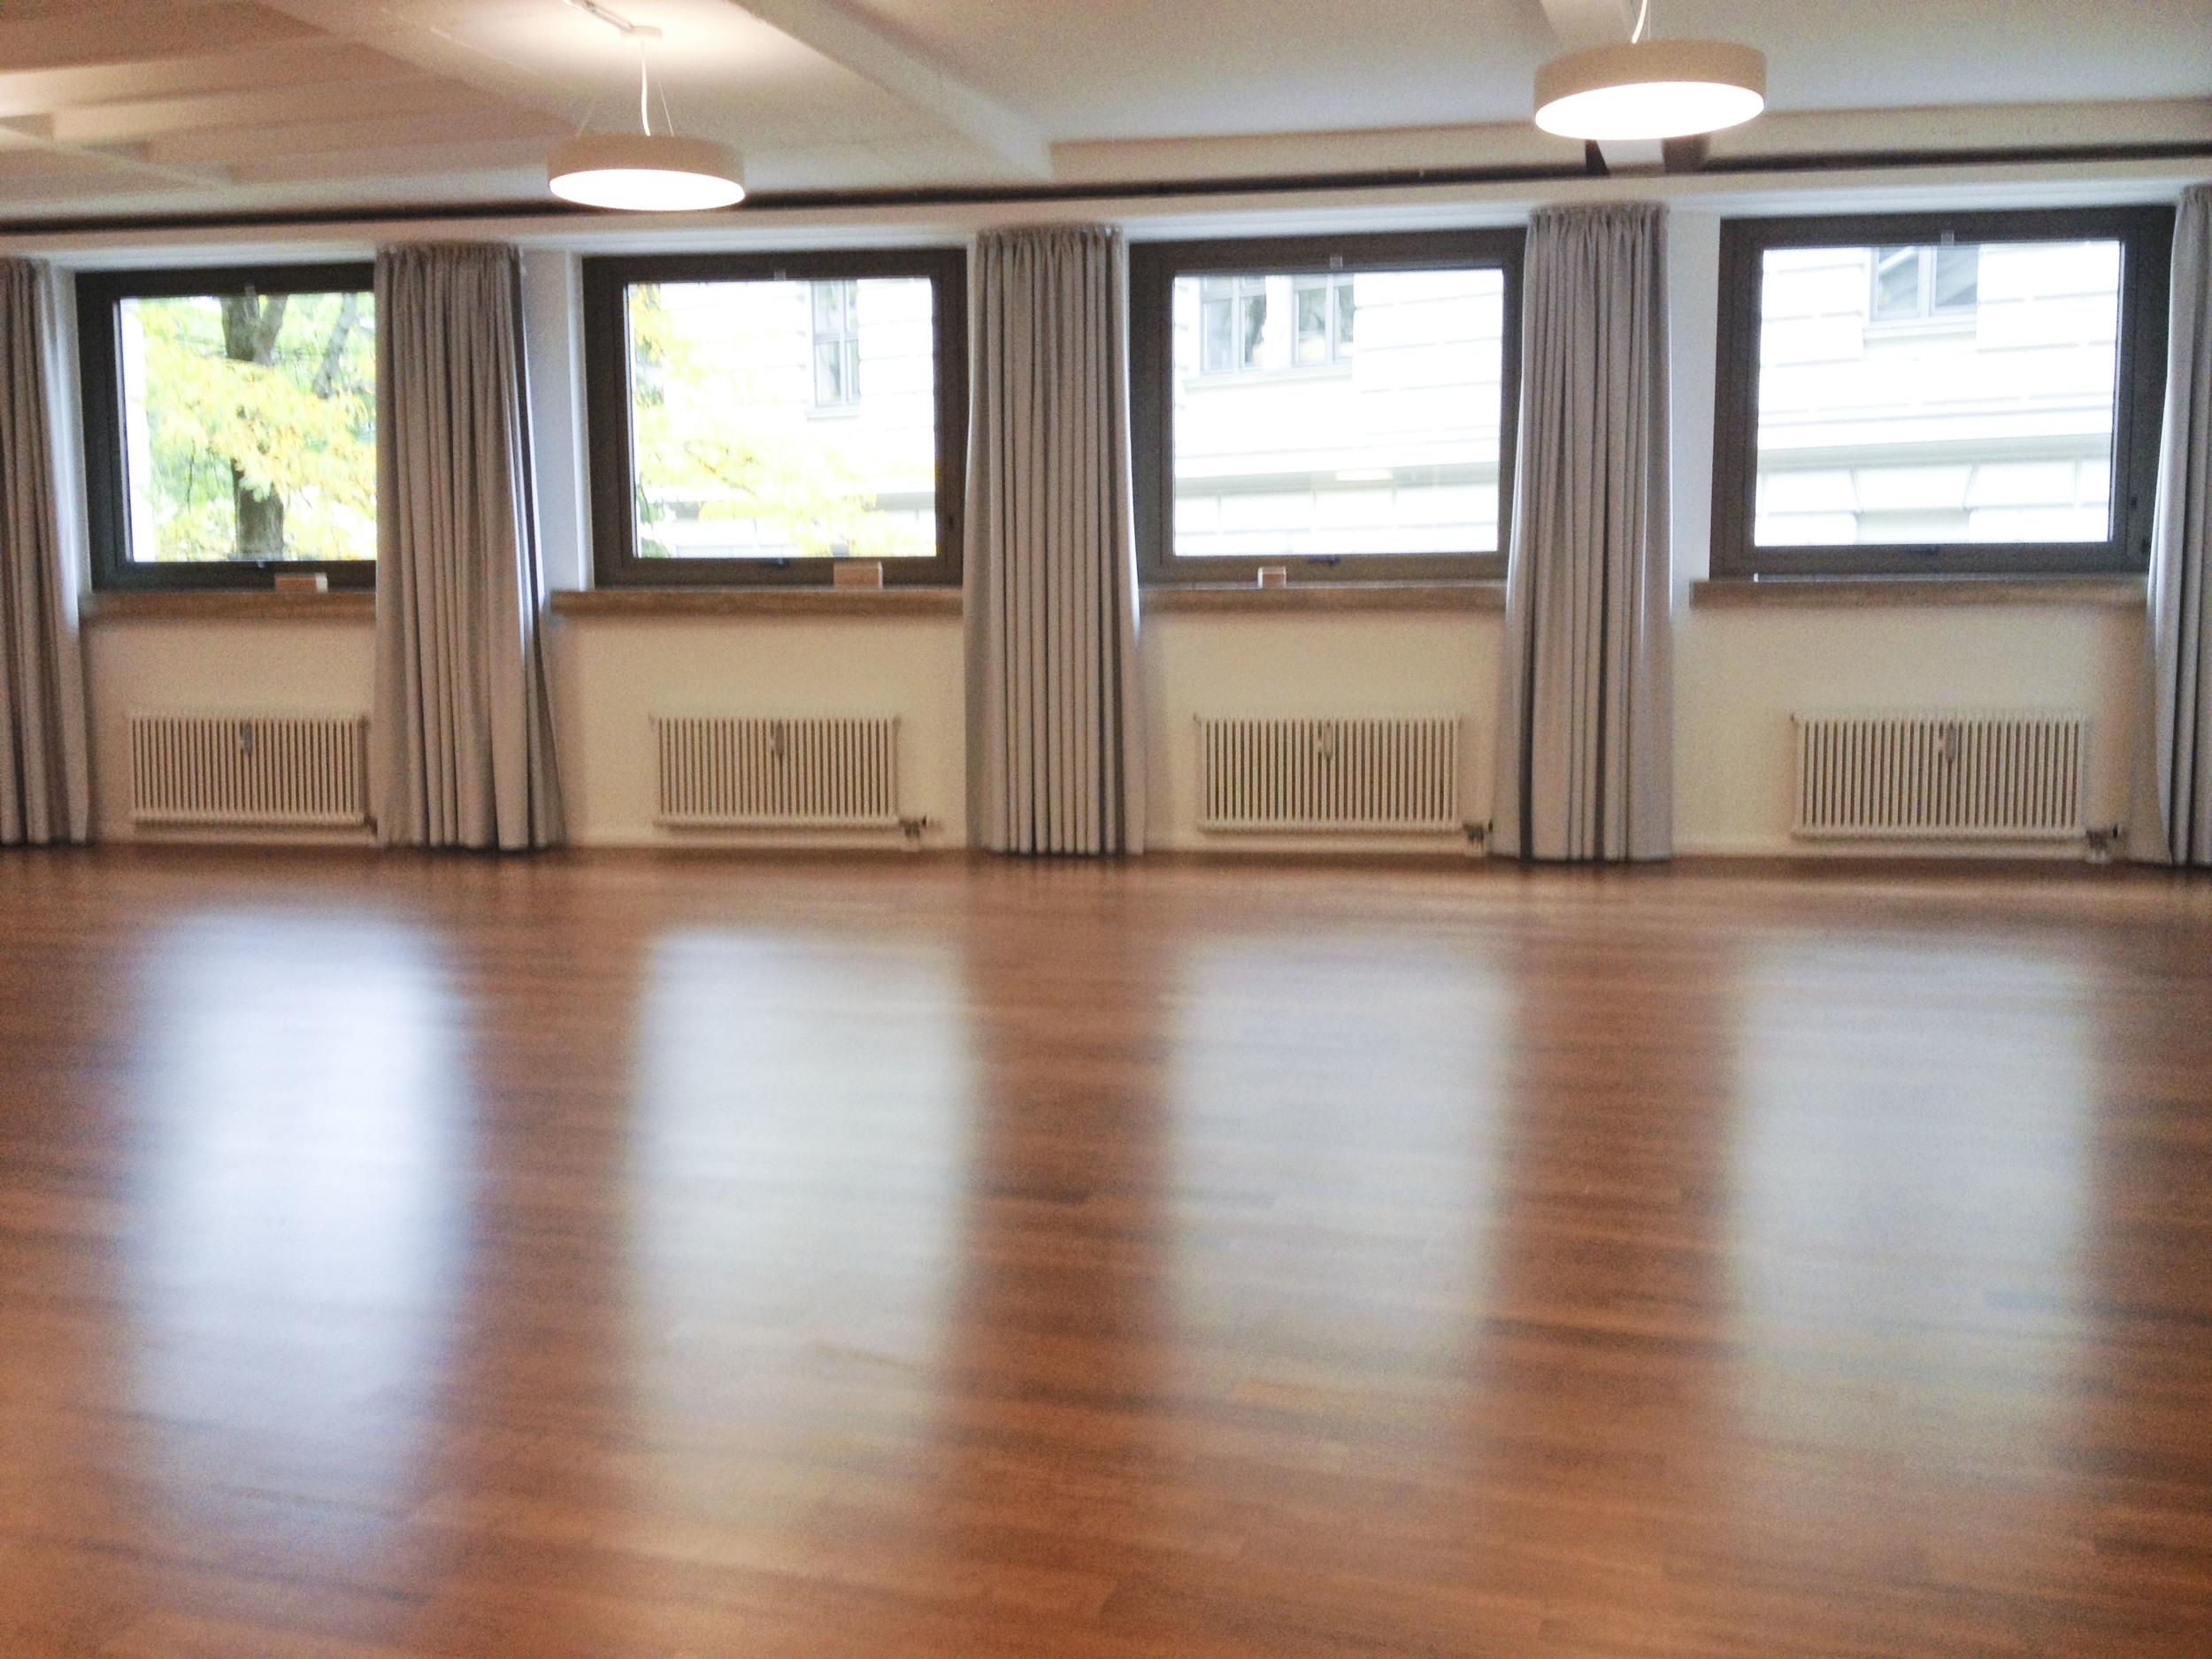 Patrick Broom Yoga, Yoga Studio, München 2175.jpg